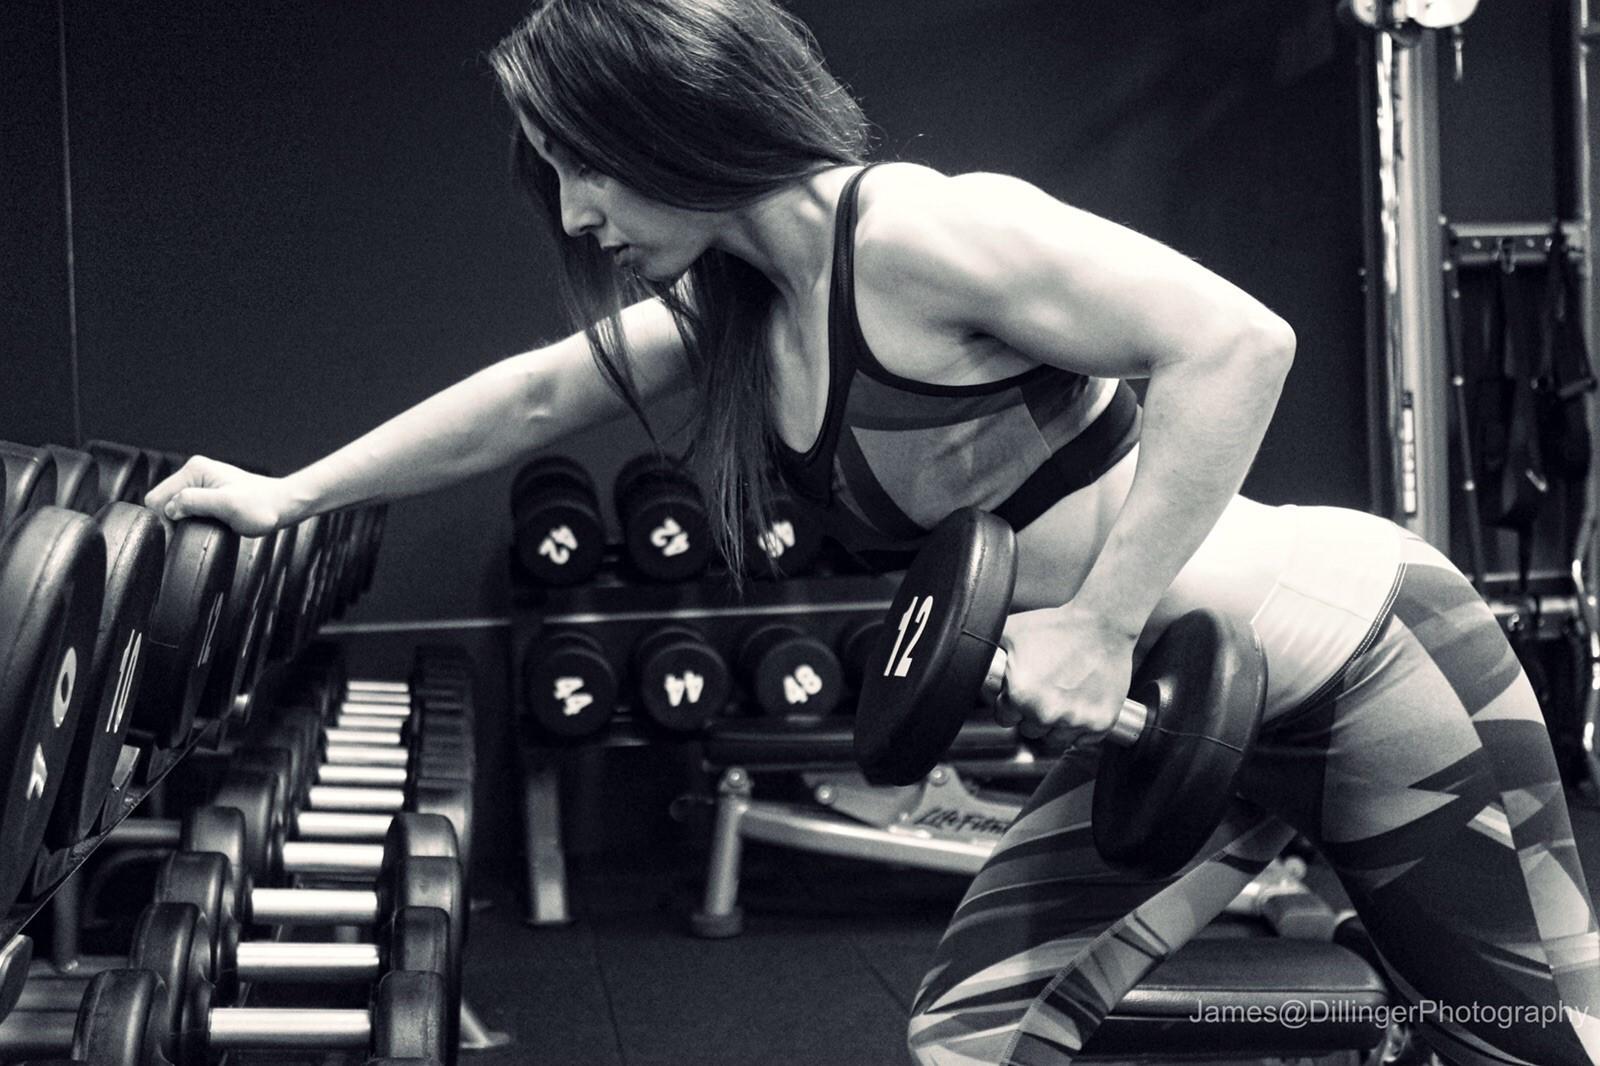 Vegan athlete interview: Tsuki Harris